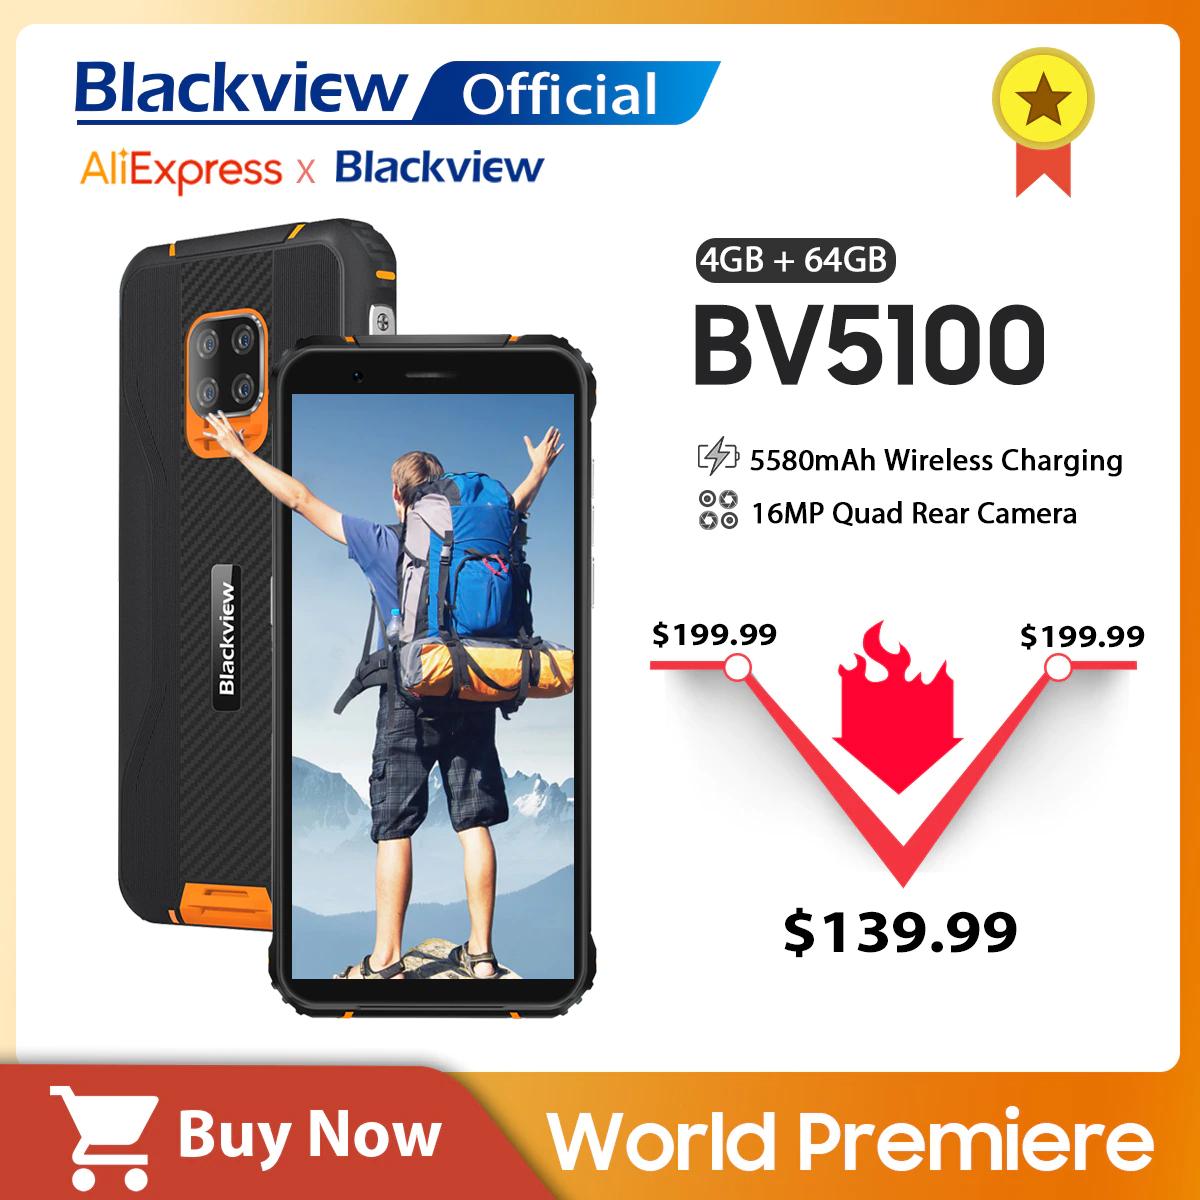 Smartfon Blackview 4G VoLTE IP68 IP69K MIL-STD-810G 4/64GB 5580mAh Android 10 NFC Smartphone - $139.99 i darmowa wysyłka